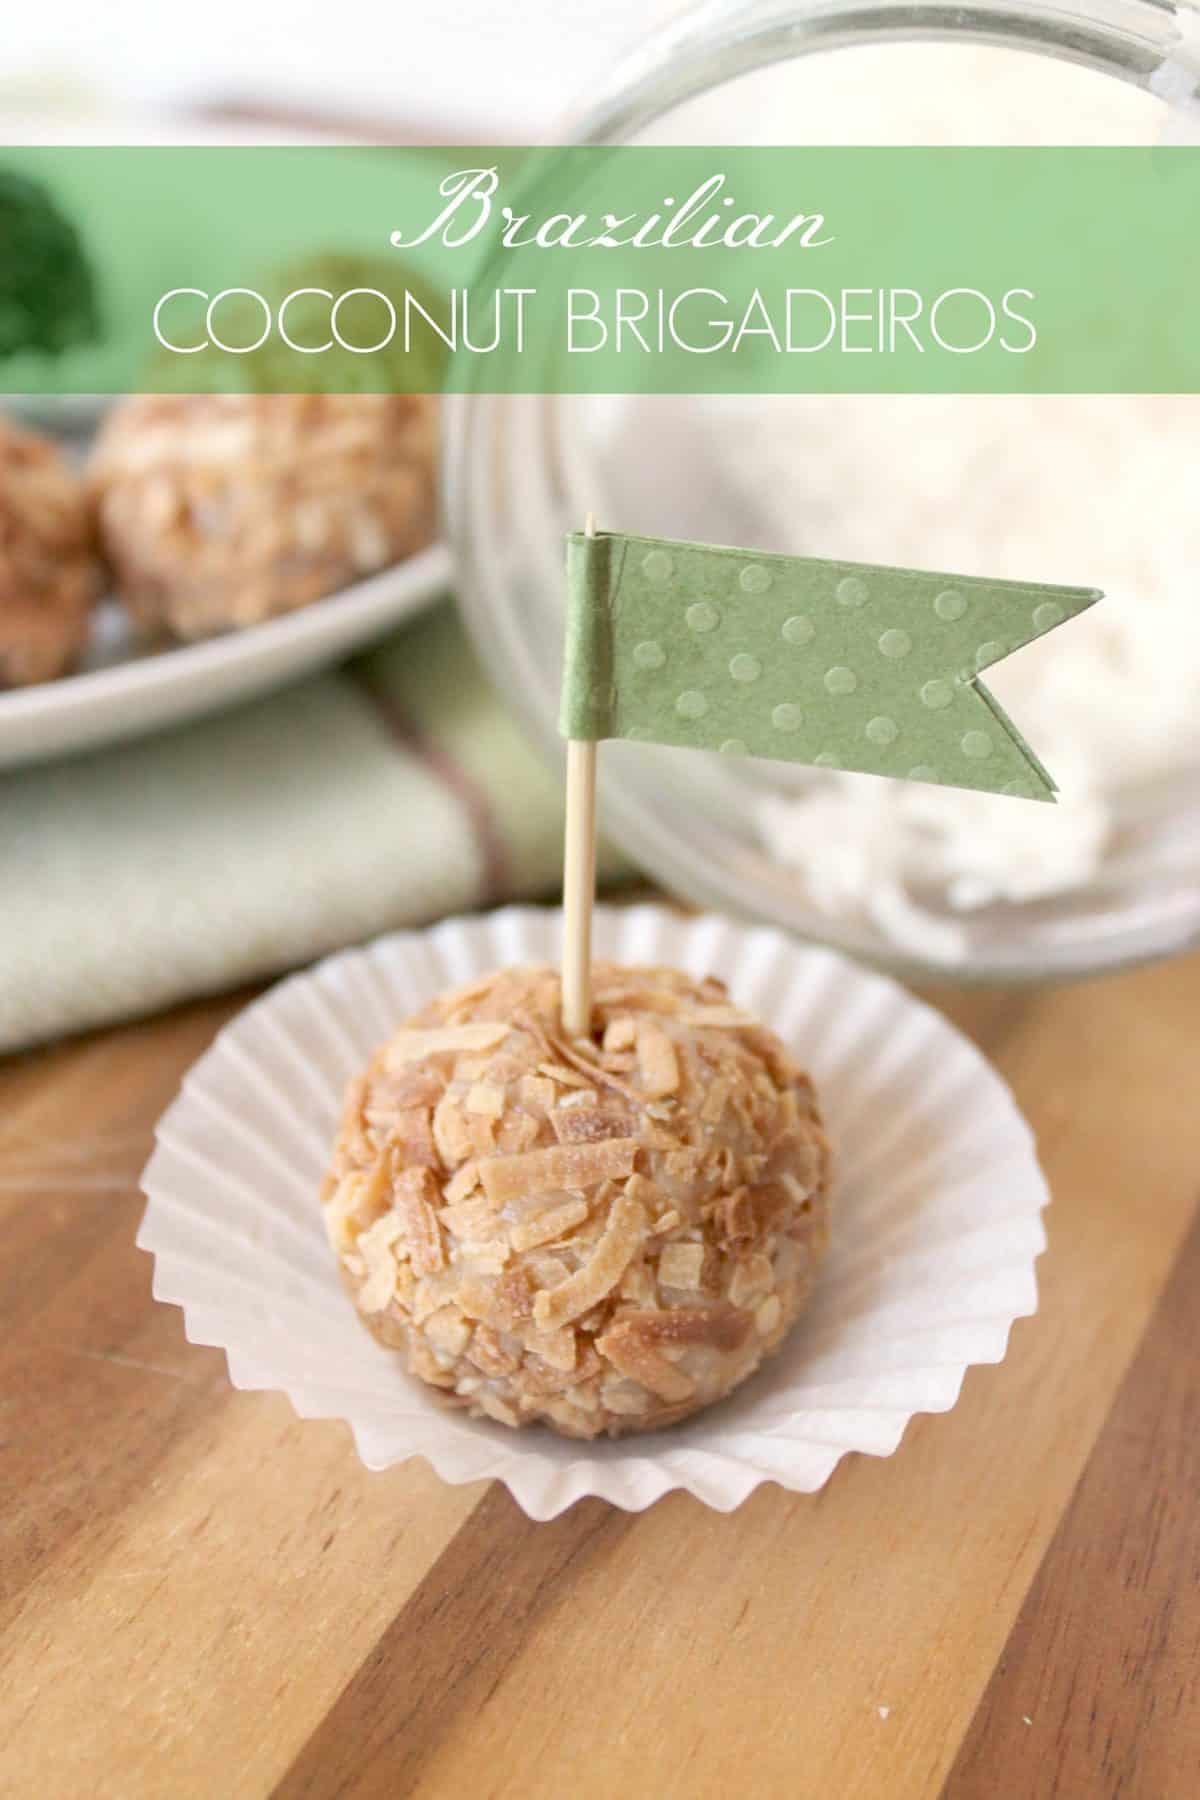 Brazilian Coconut Brigadeiros from The Kitchen Prep on KatiesCucina ...